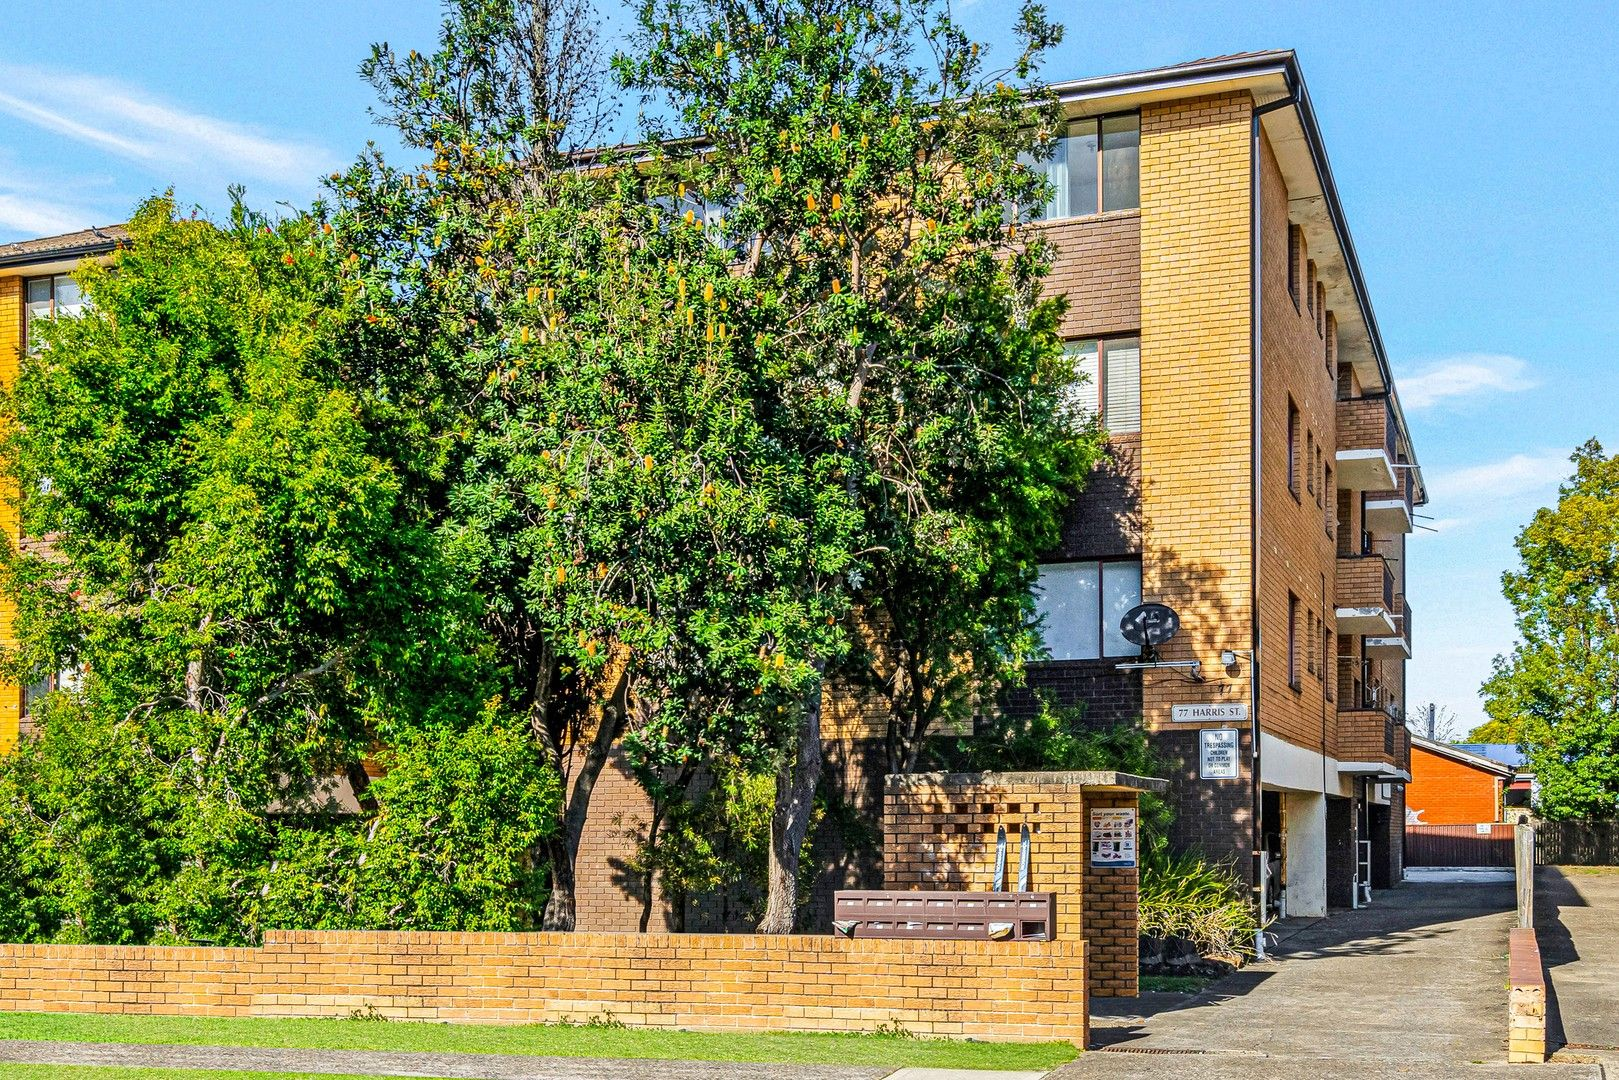 10/77 Harris Street, Fairfield NSW 2165, Image 0